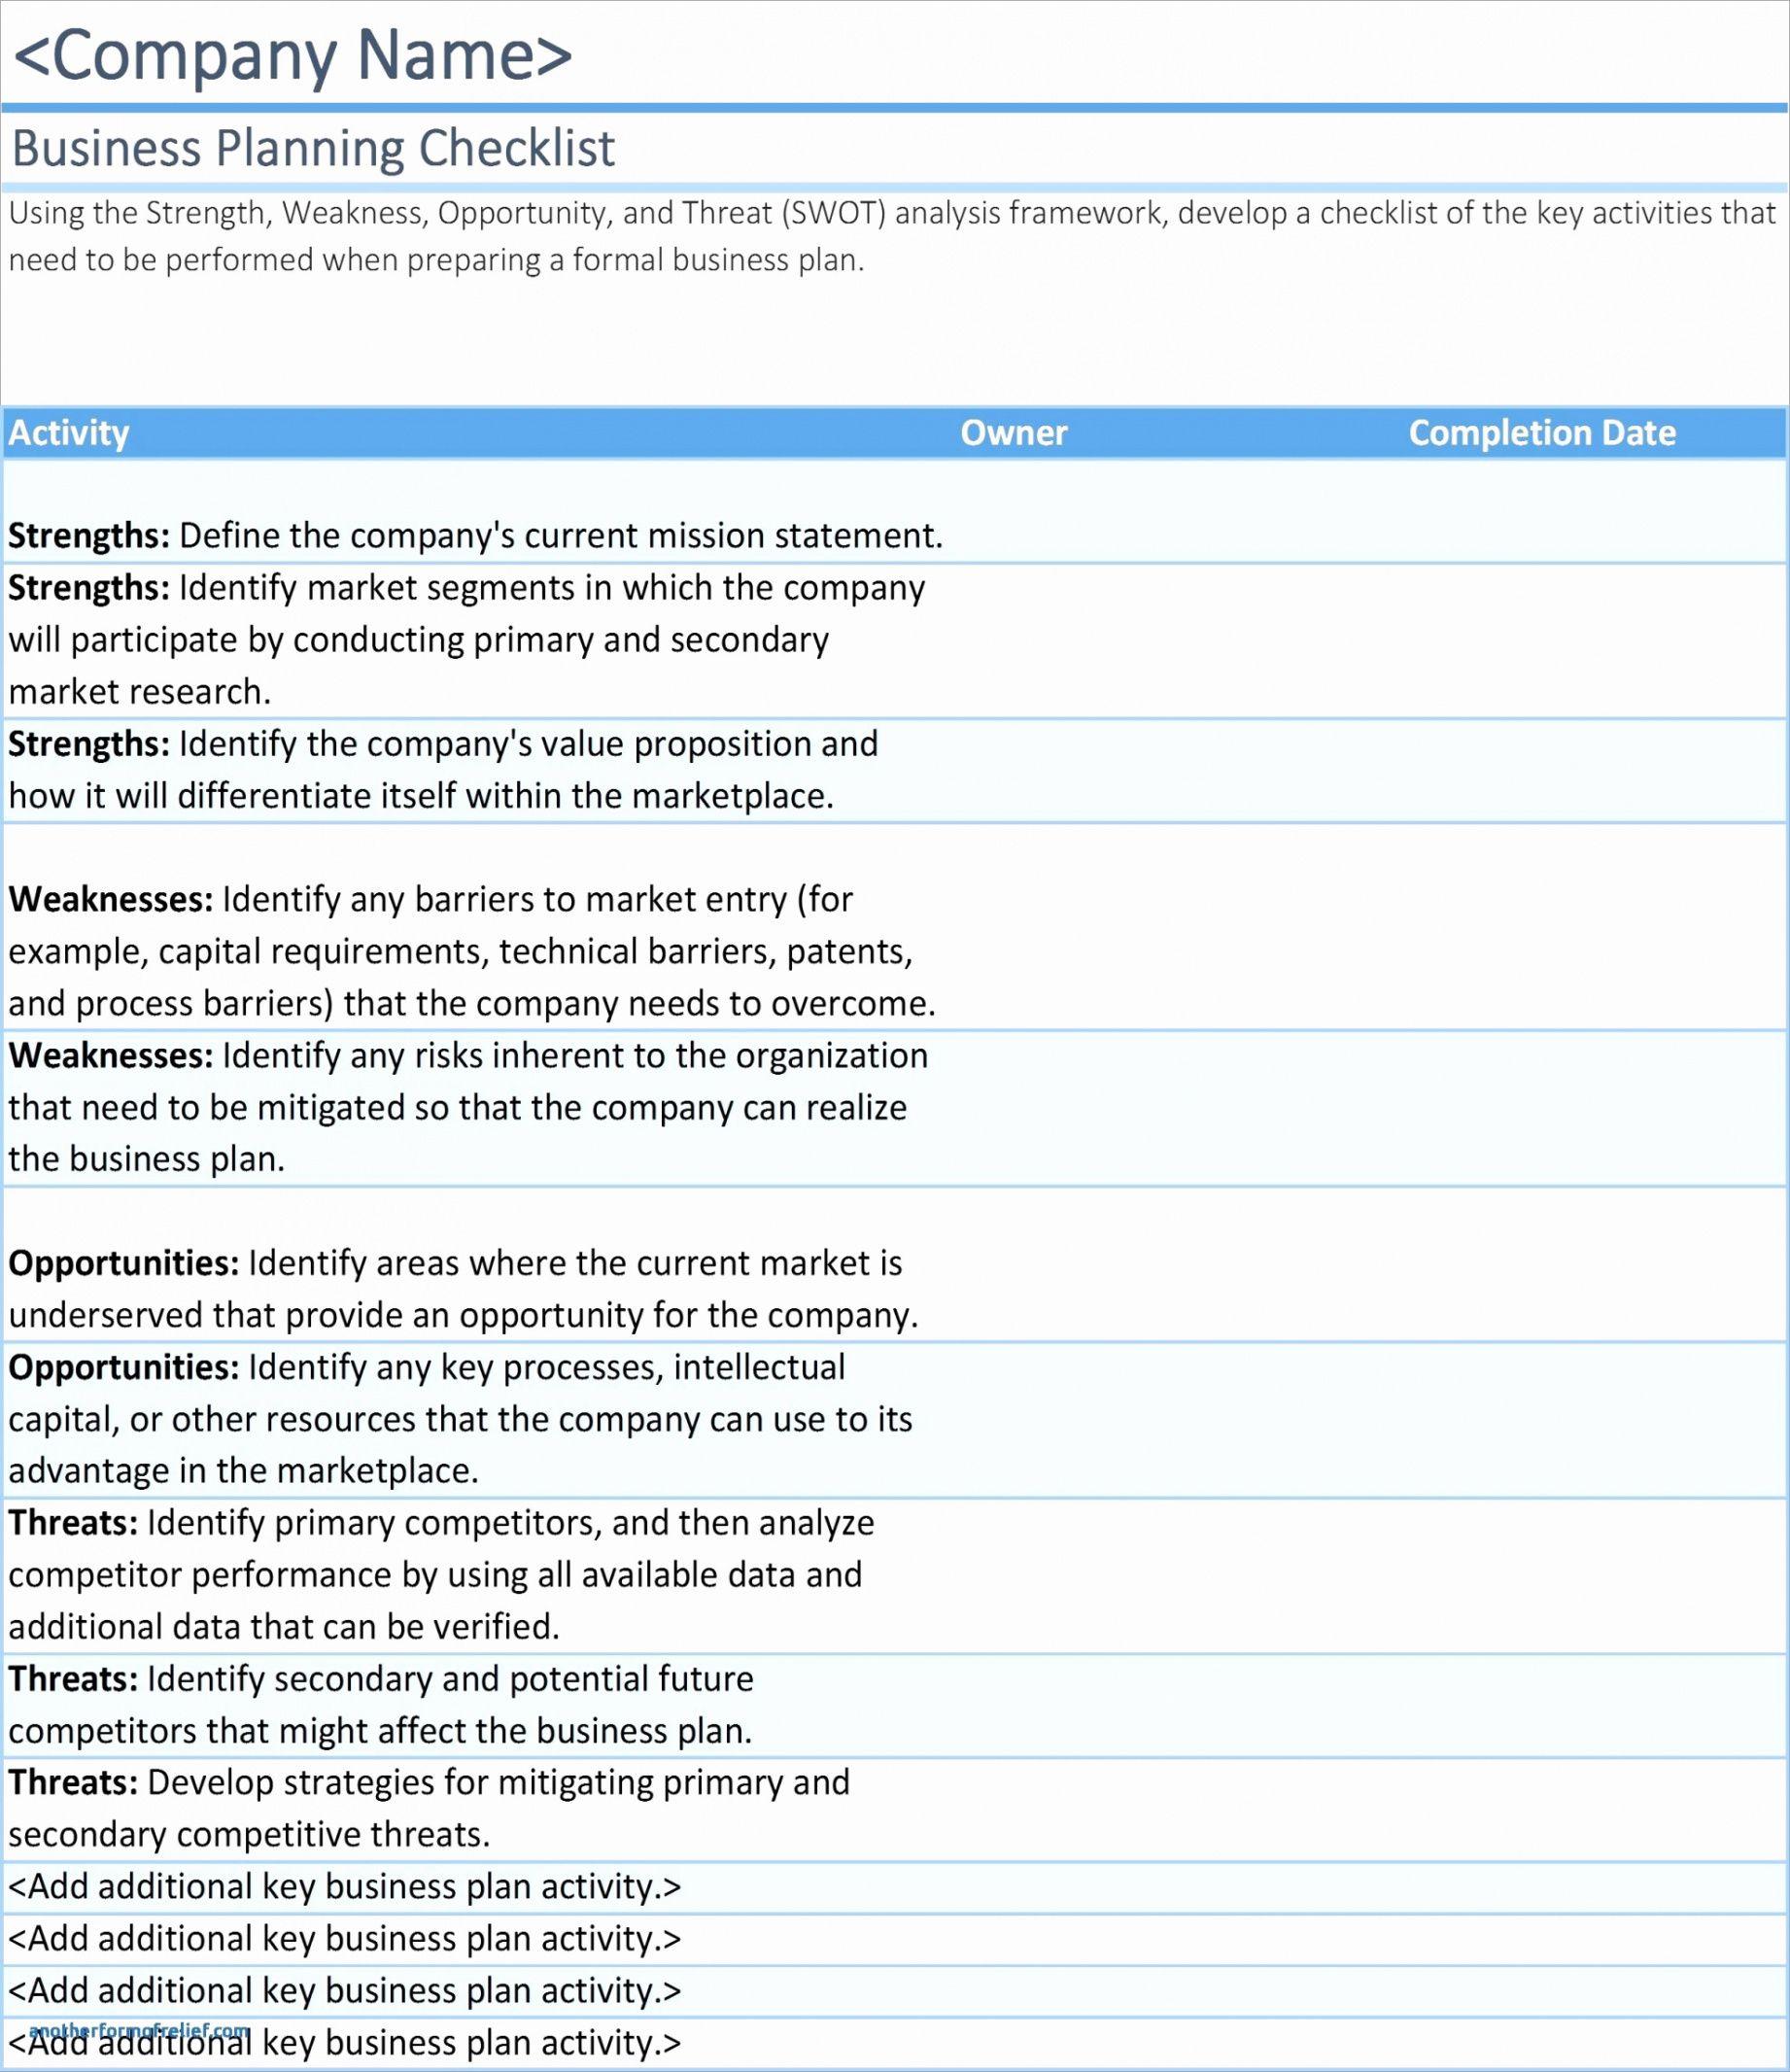 editable business valuation spreadsheet or fantastic report template business valuation report template